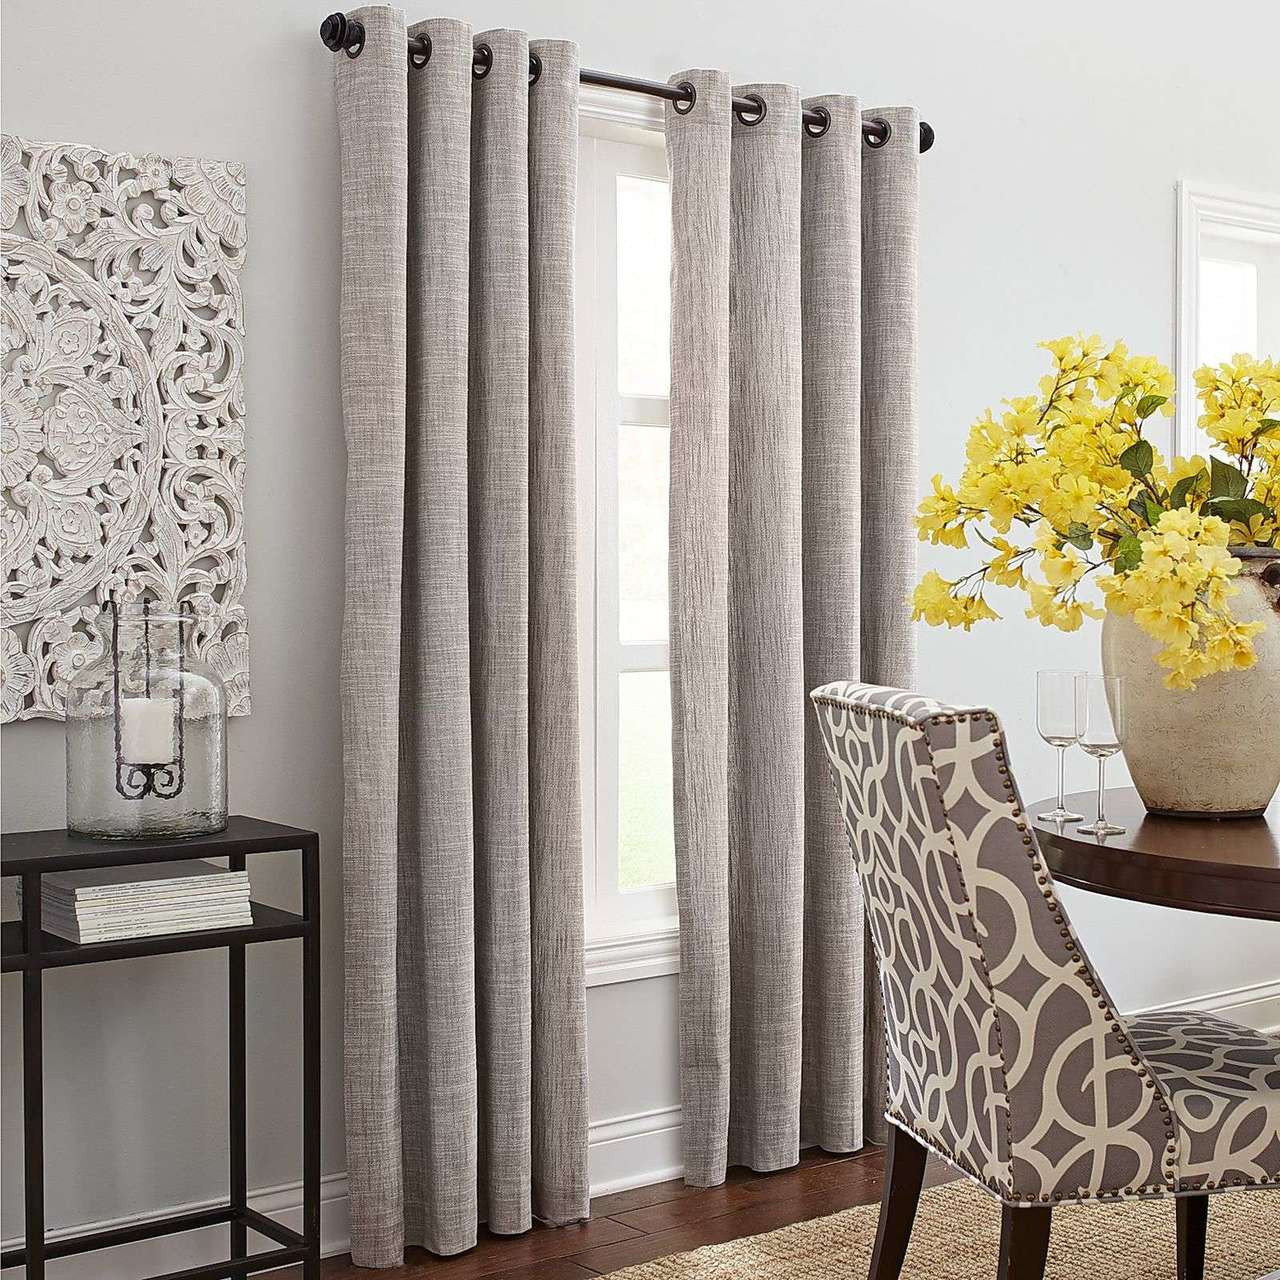 Chambray Rustic Raspberry Linen Curtain